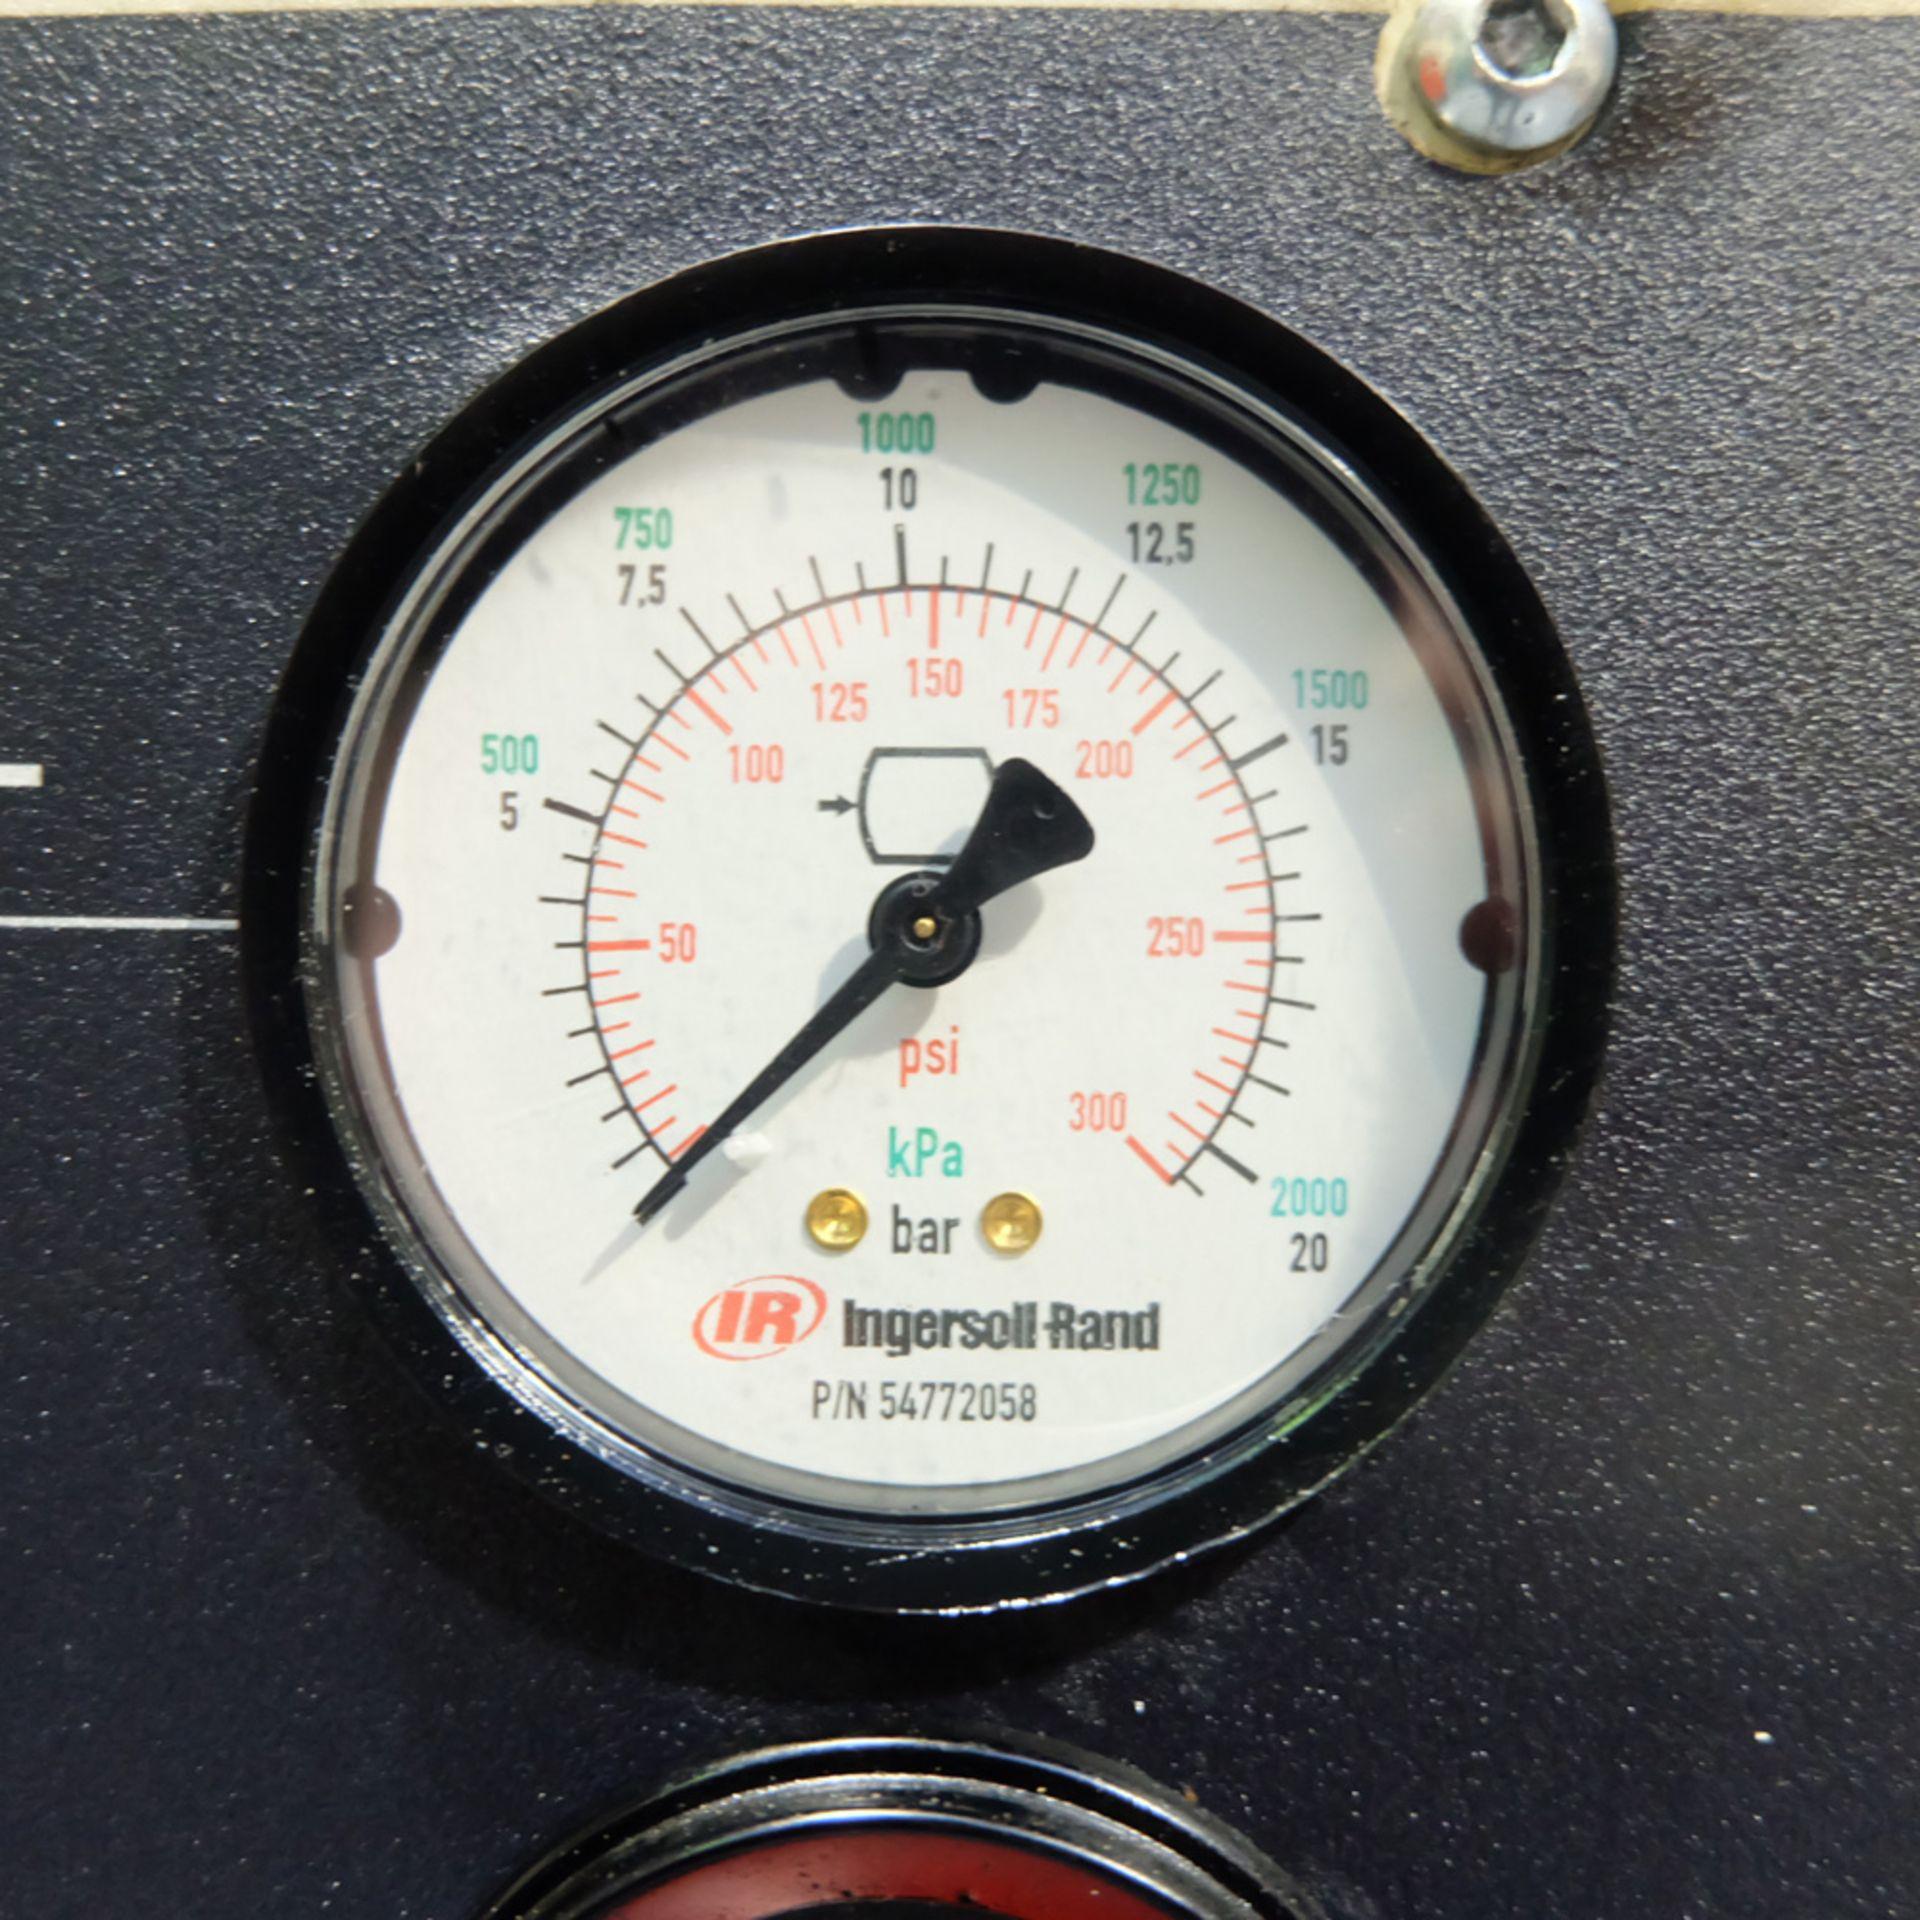 Ingersoll Rand Model R5.5IU D-SD Rotary Air Compressor. Working Pressure 10 Bar. - Image 5 of 9